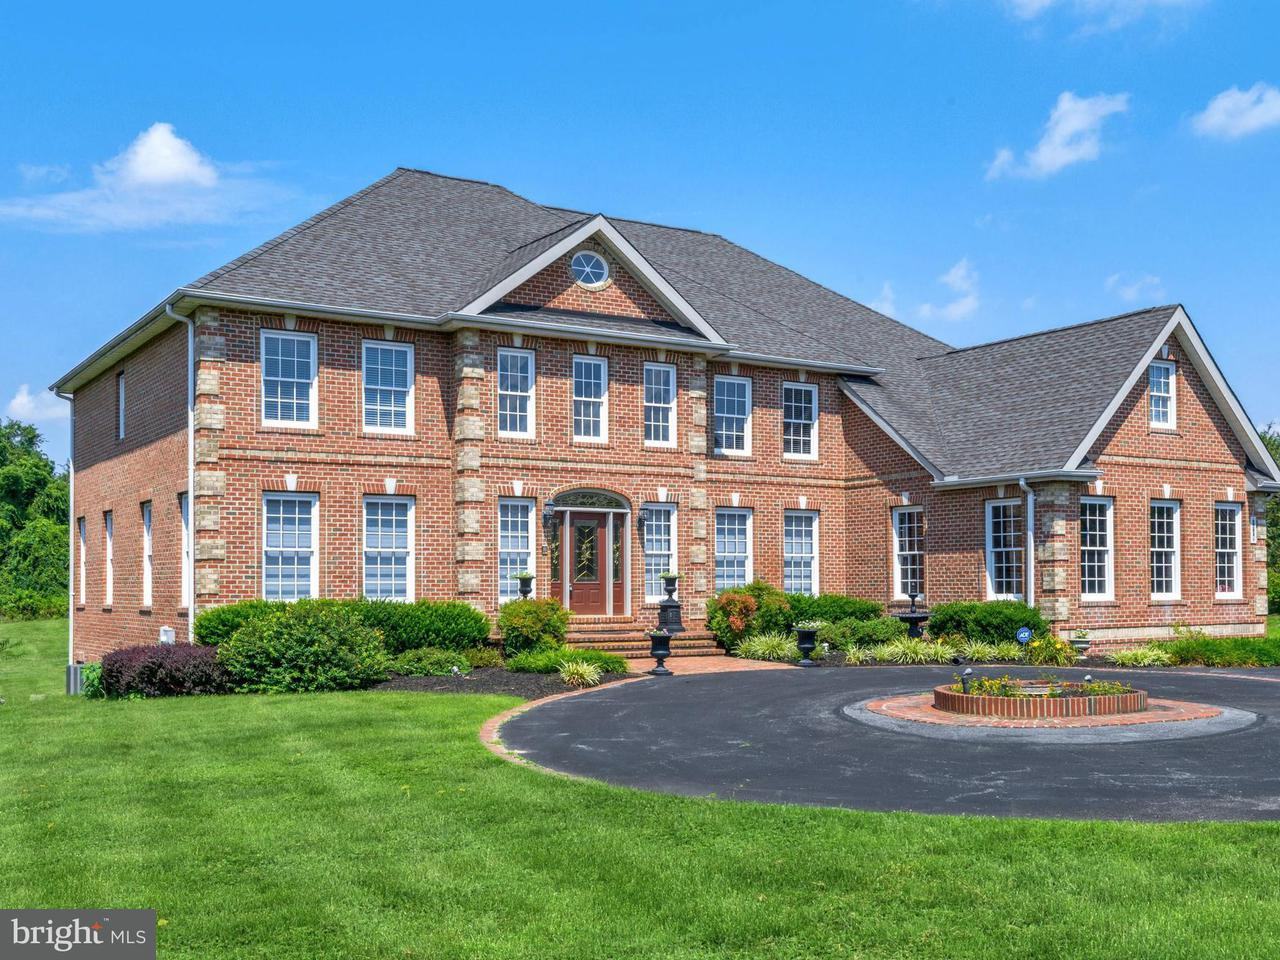 Casa Unifamiliar por un Venta en 1119 THOMAS SWANN Lane 1119 THOMAS SWANN Lane Davidsonville, Maryland 21035 Estados Unidos